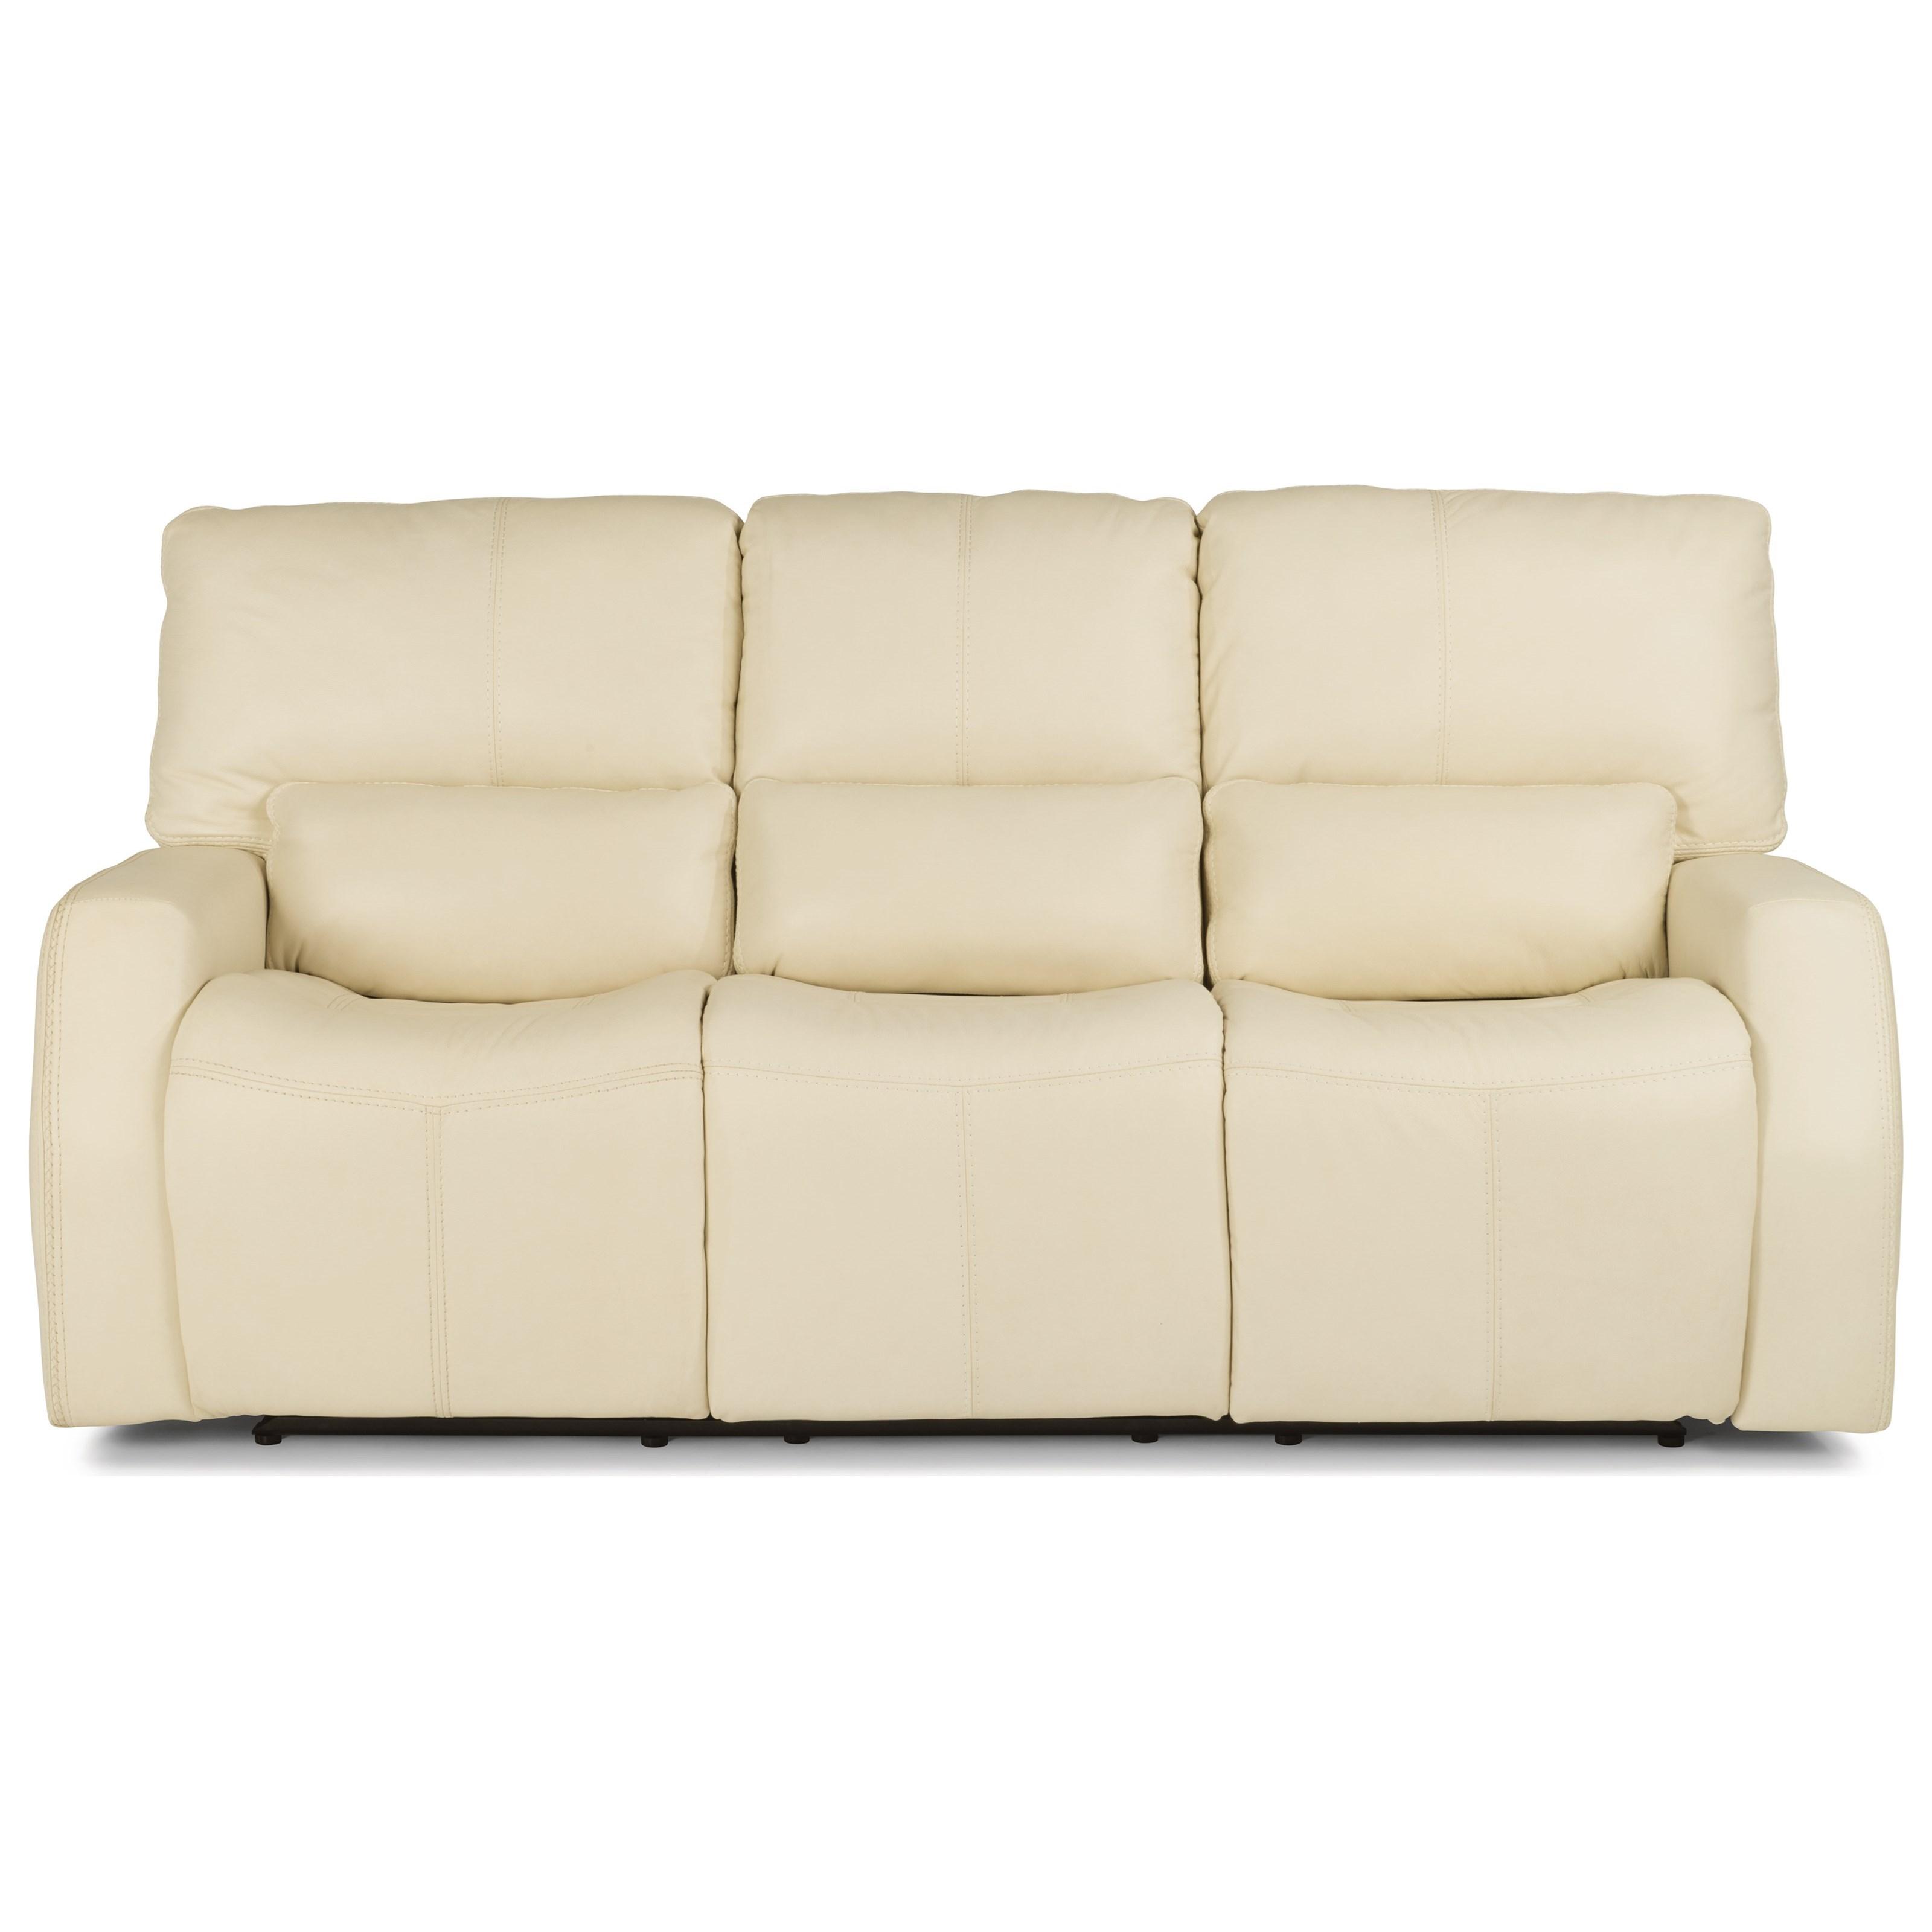 Flexsteel Wrangler Sofa: Cooper 1423-62PH Contemporary Power